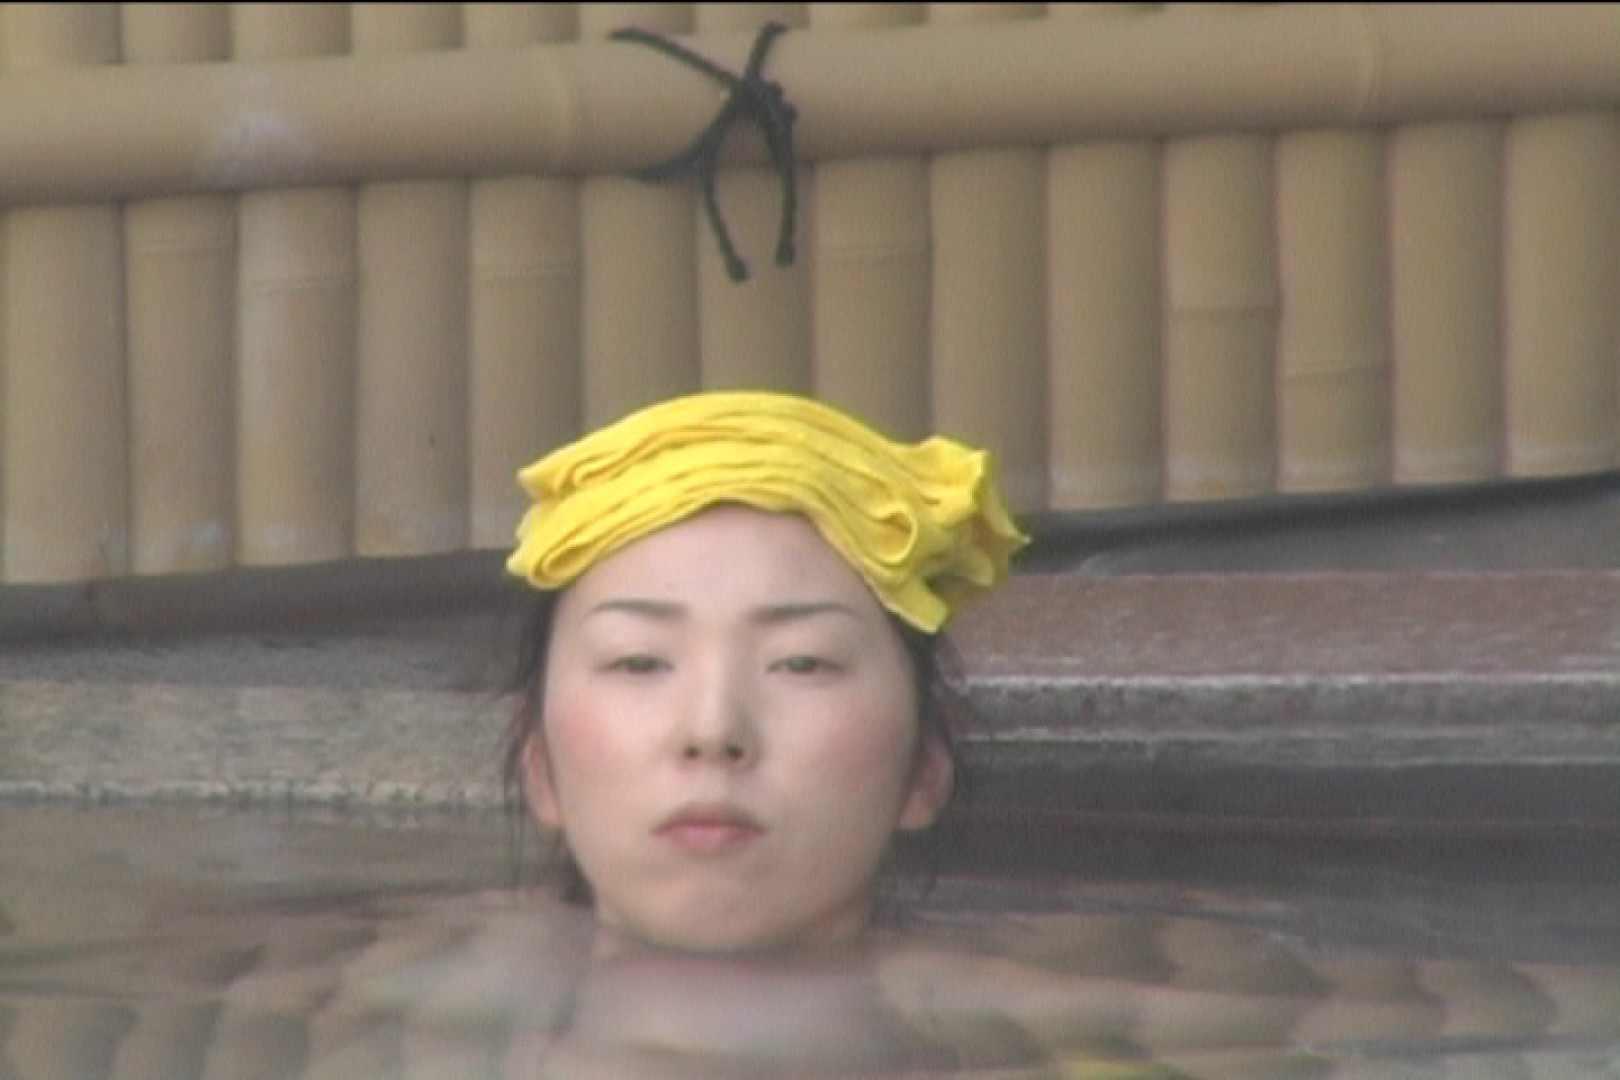 Aquaな露天風呂Vol.529 盗撮シリーズ | 露天風呂編  106PIX 17